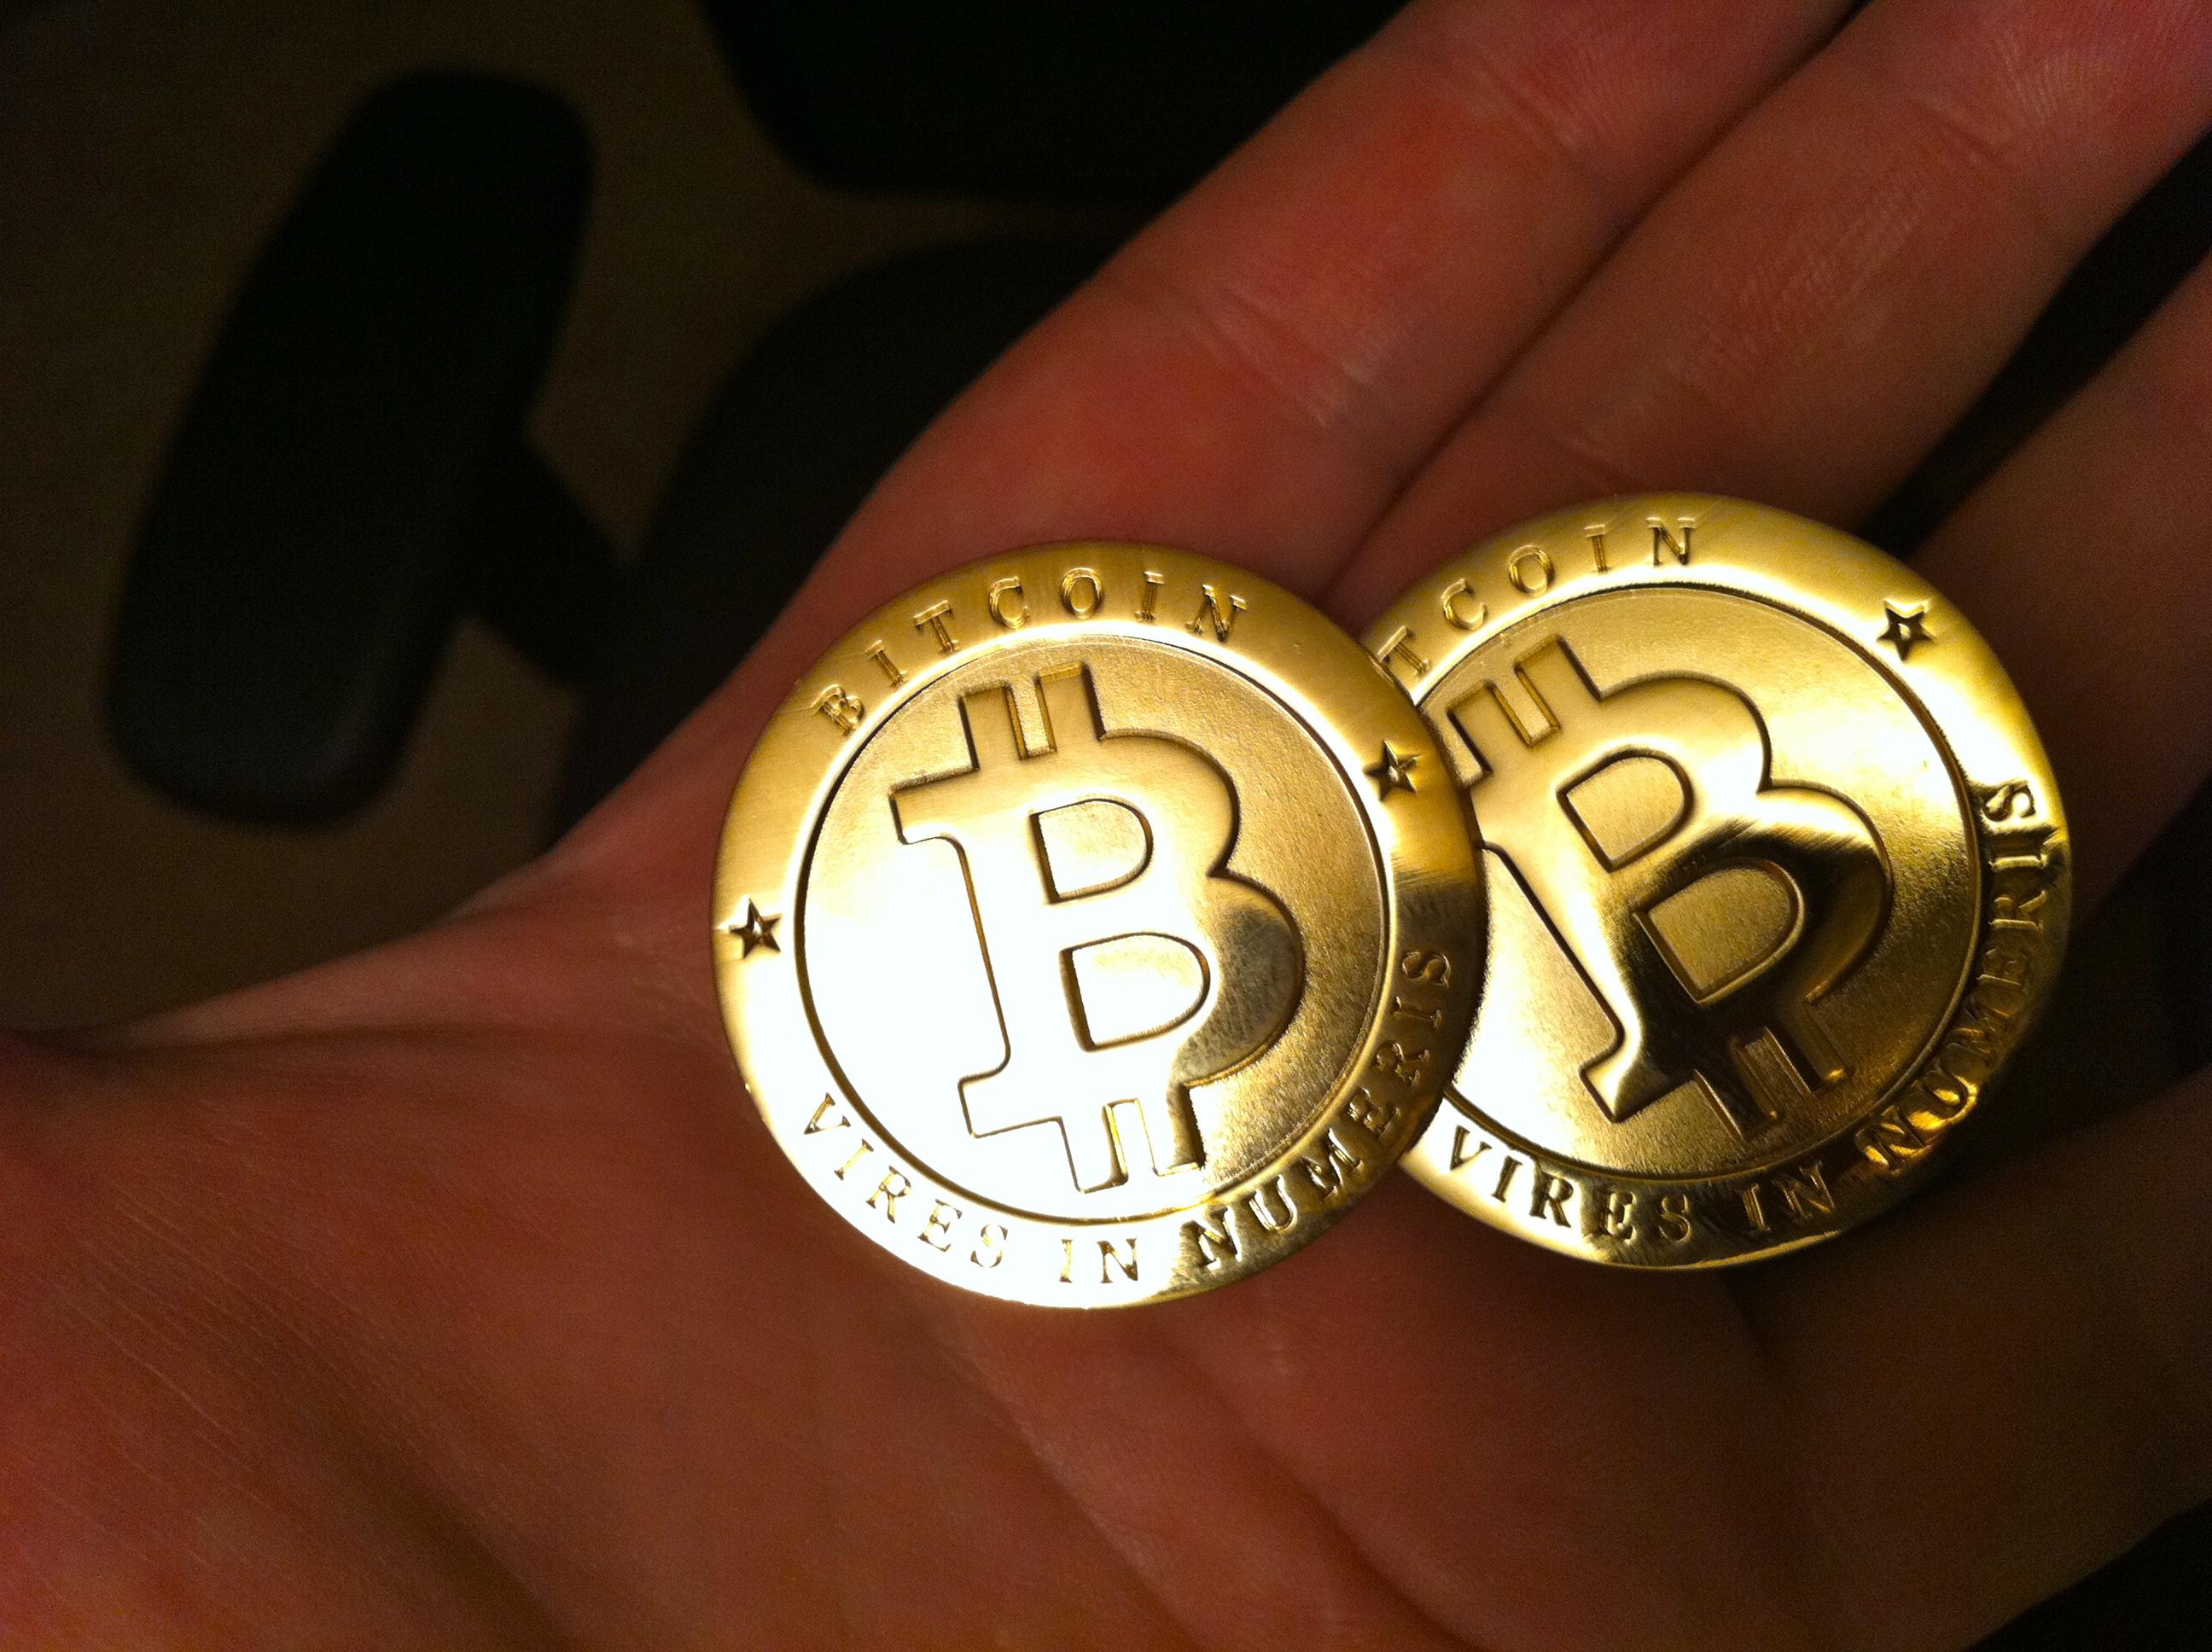 an image of bitcoin 5914558006_b558a86077_o.jpg